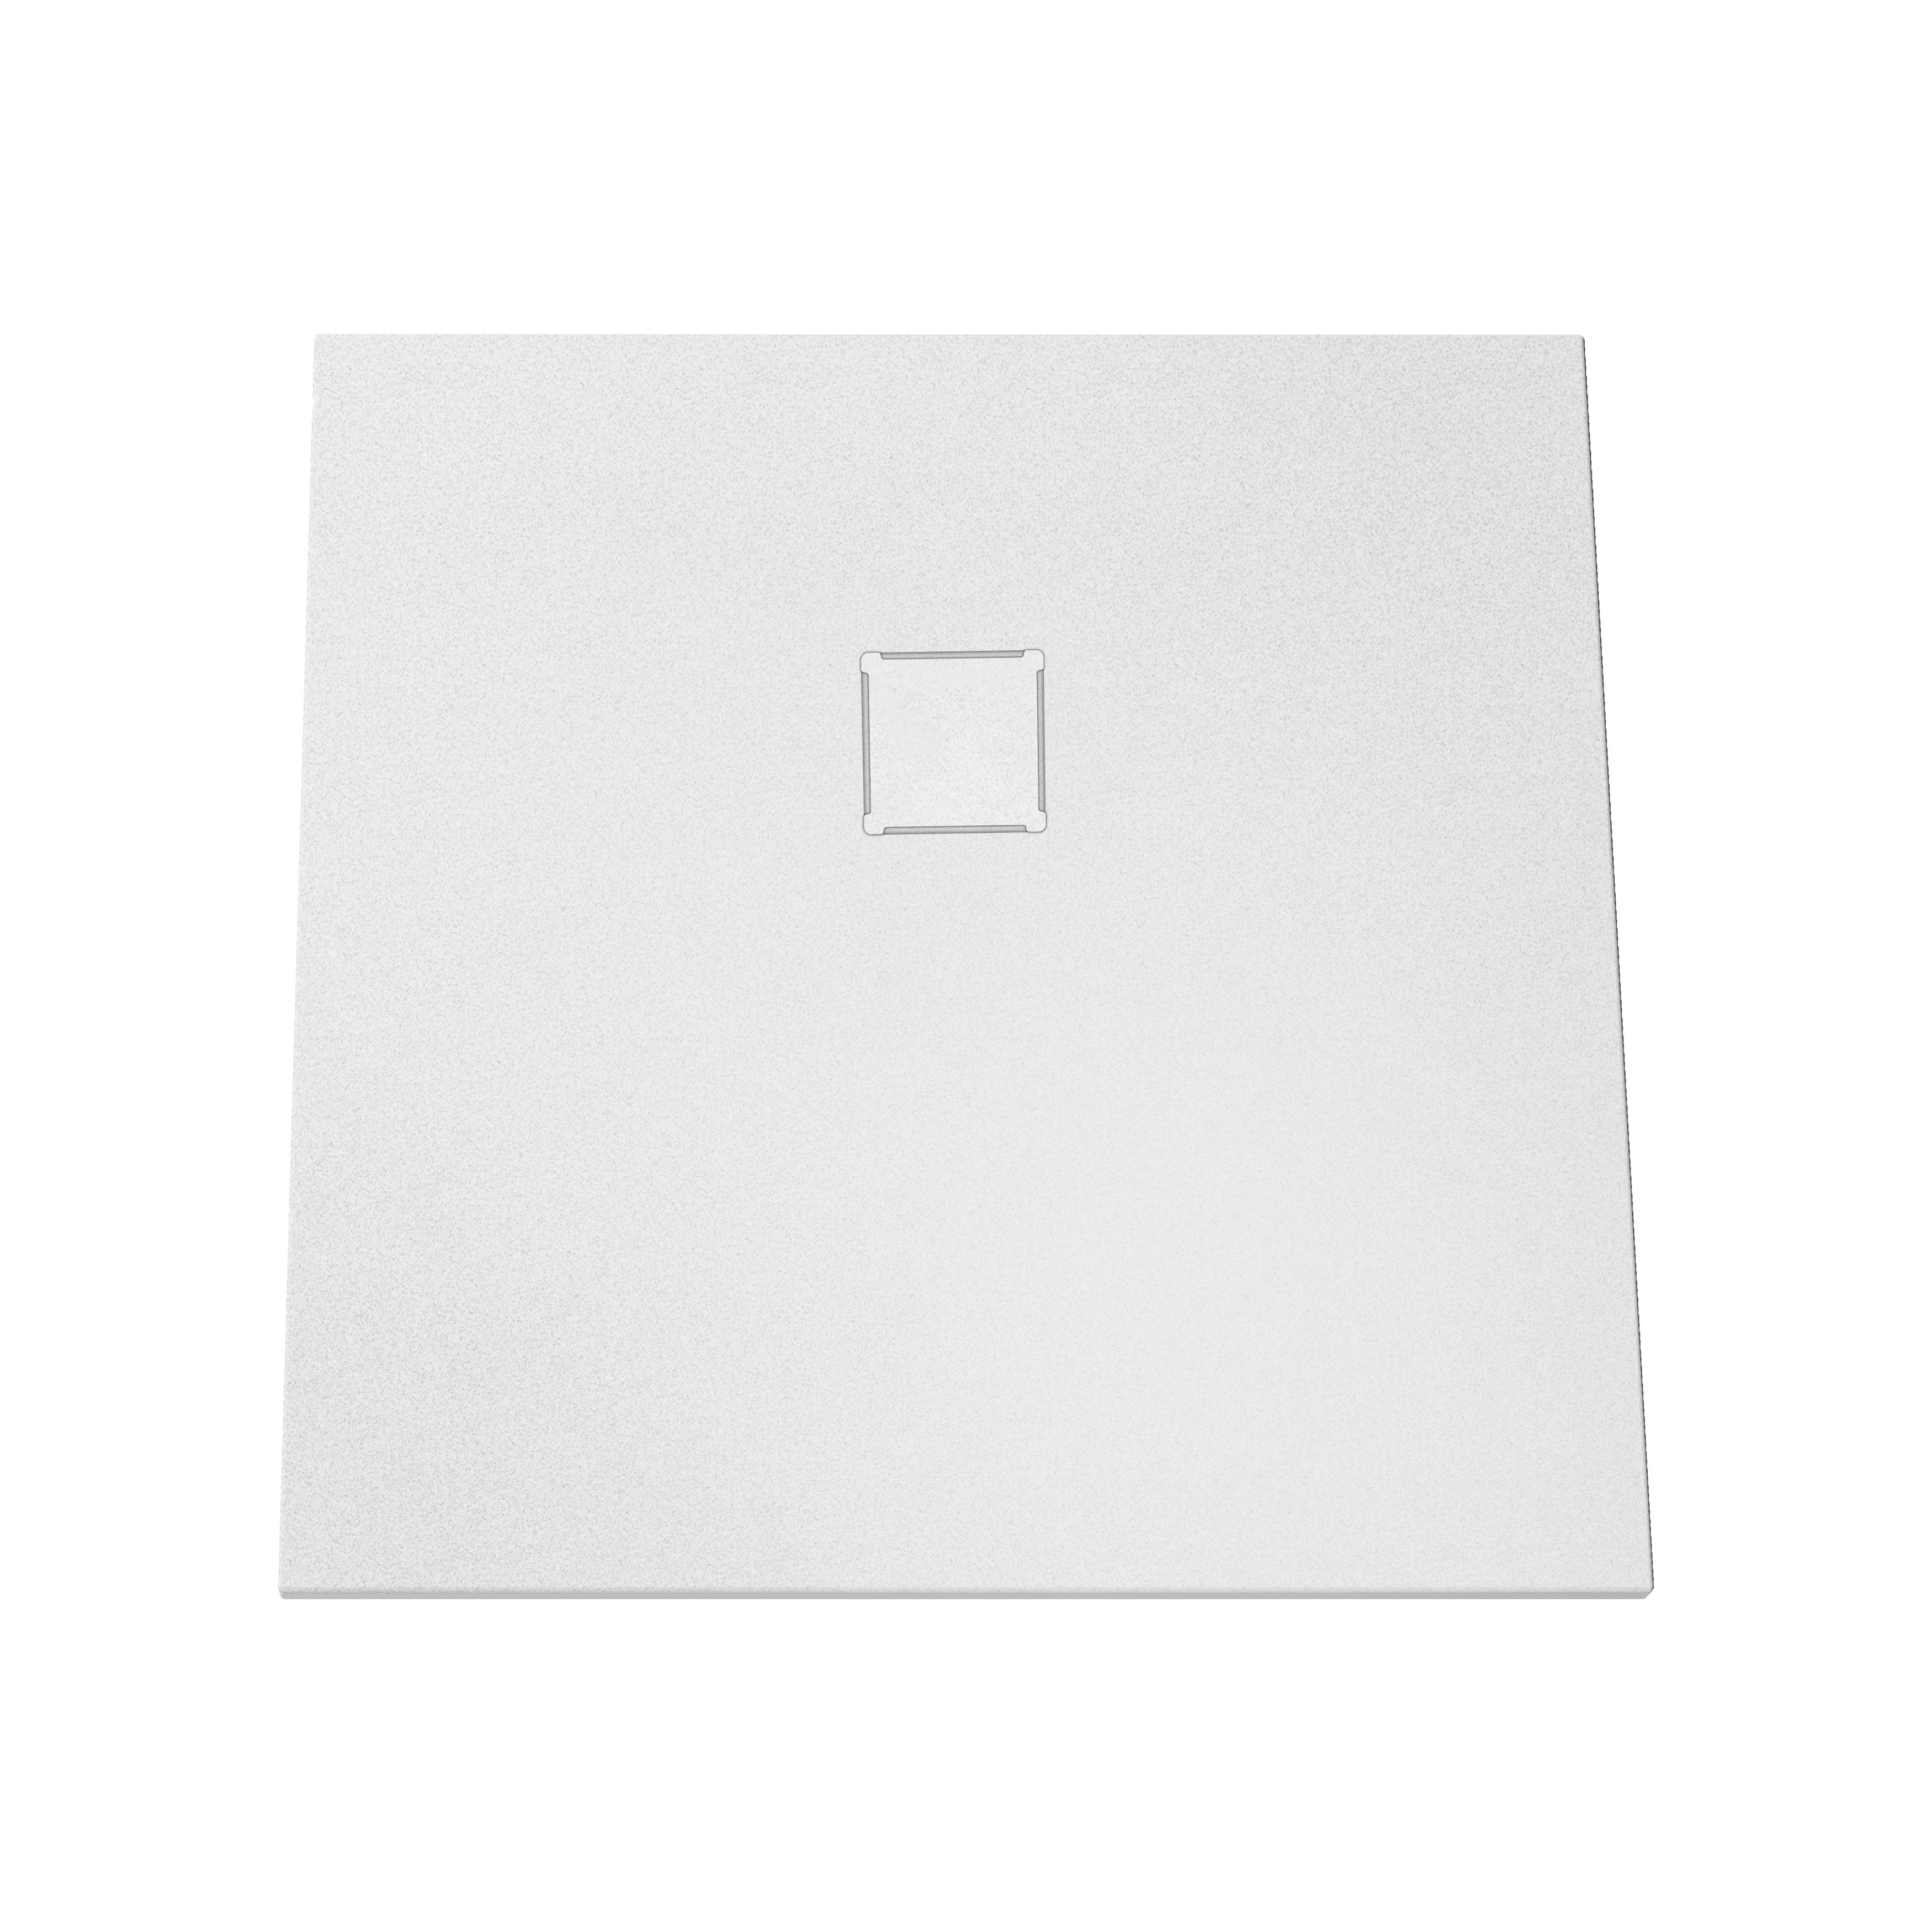 V-stone, receveur ultra plat en solid stone, 80 cm, blanc